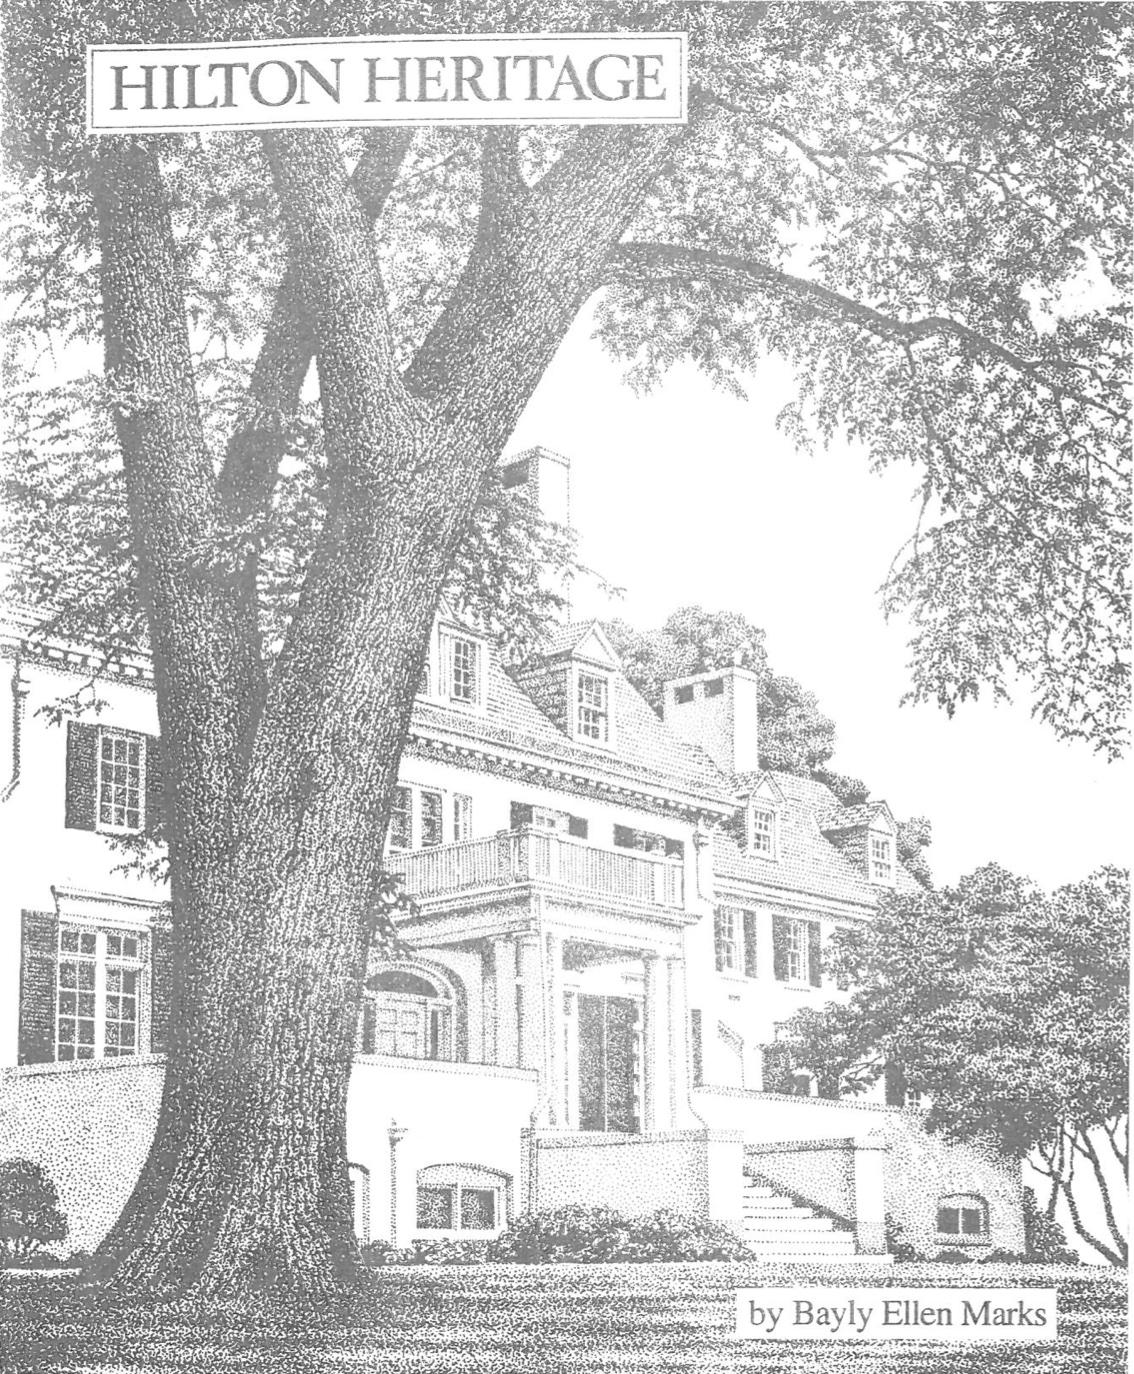 Hilton heritage book cover